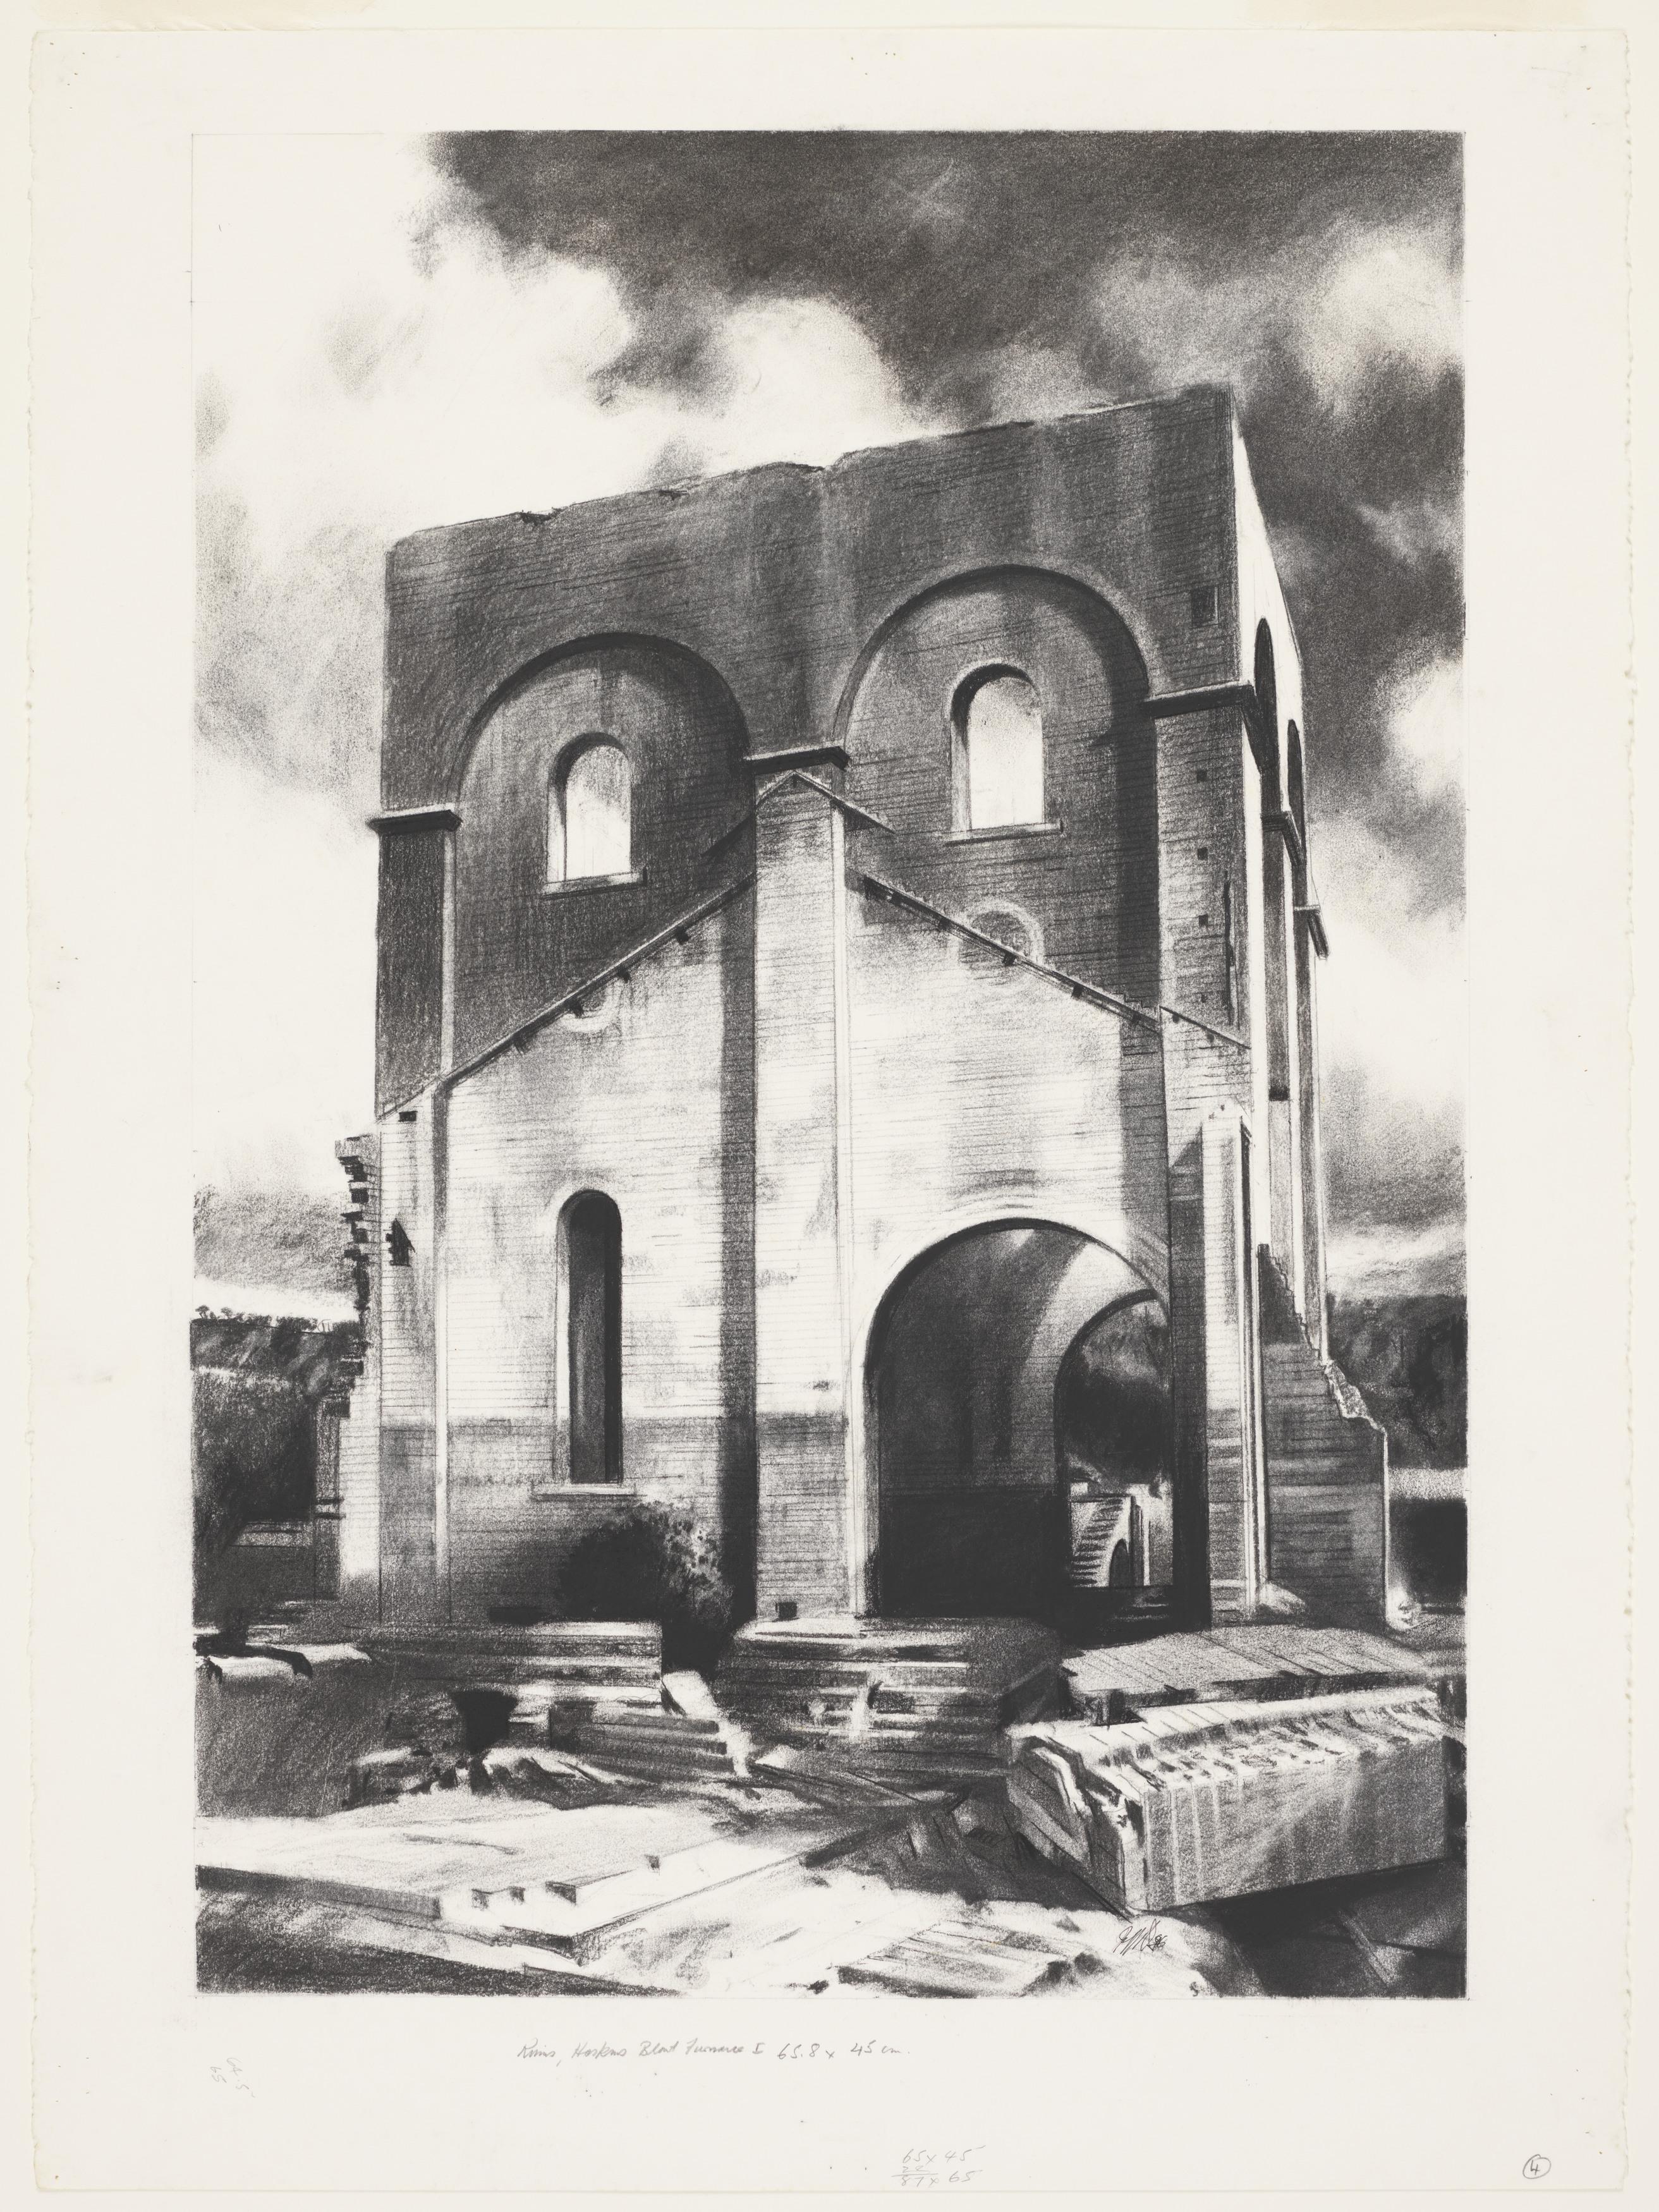 Ruins, Hoskin's Blast Furnace No. 1